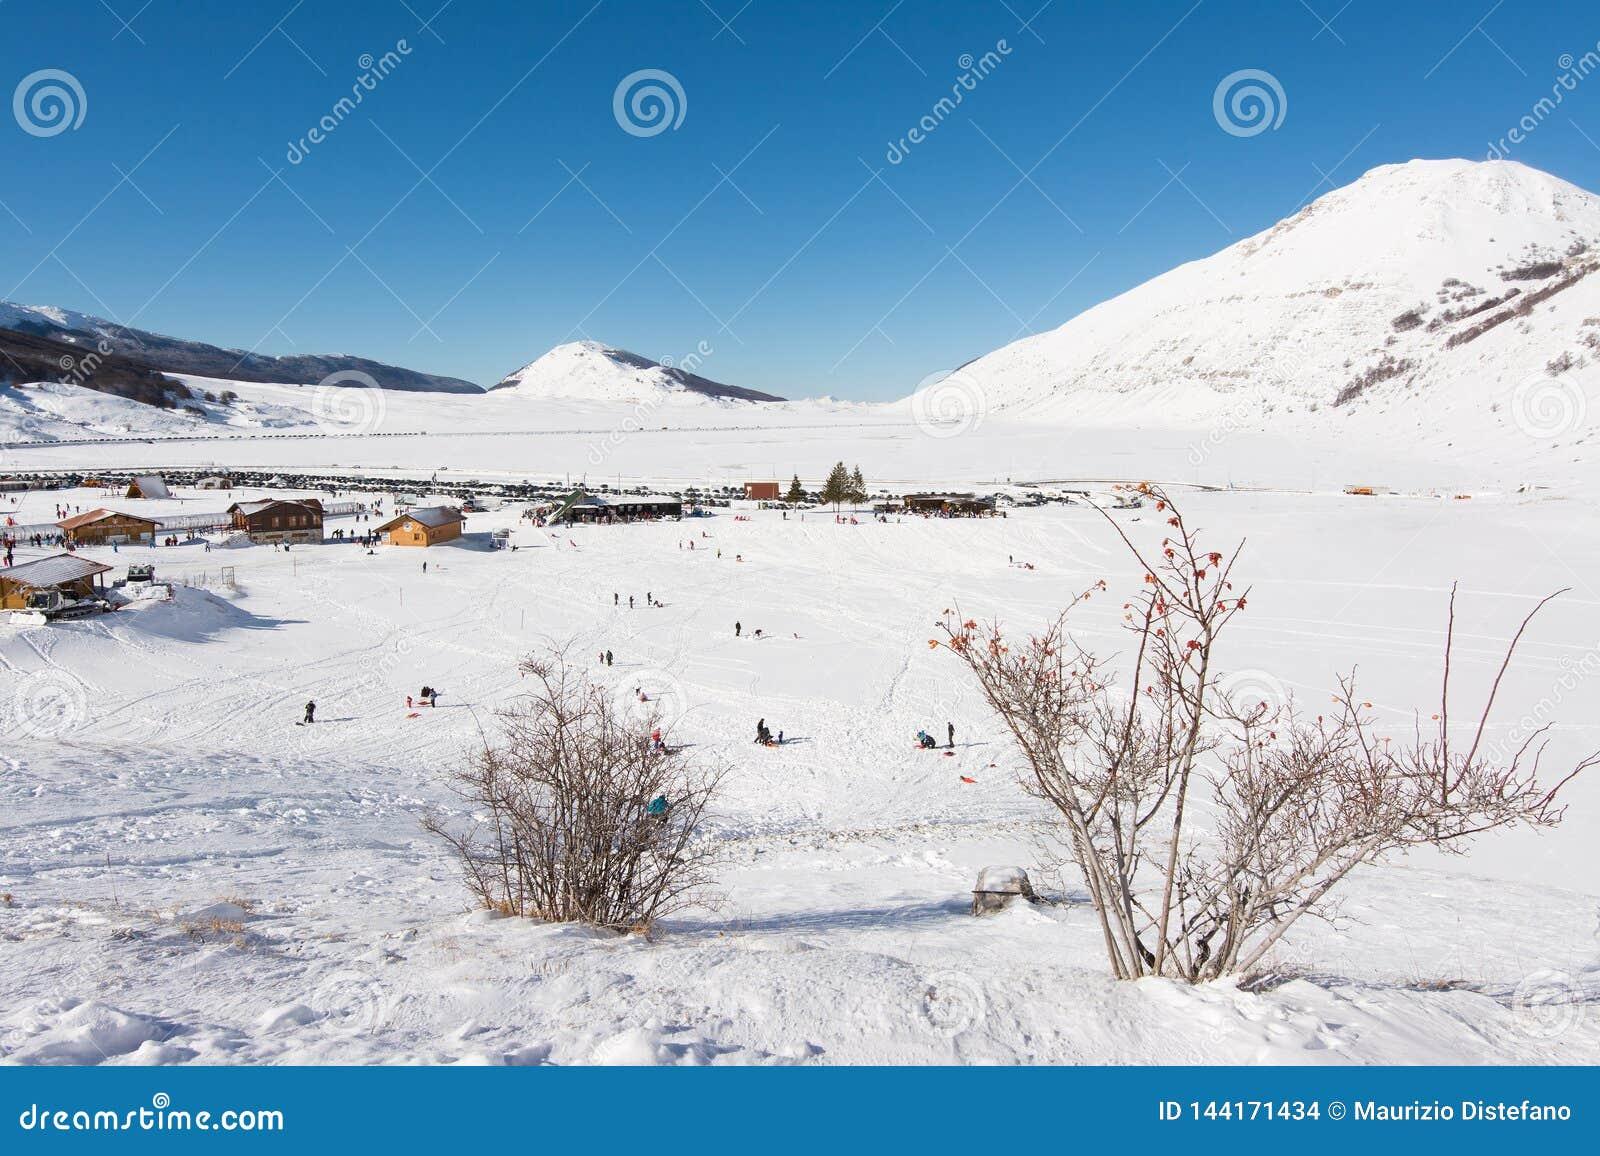 CAMPO FELICE, ITALIEN - 14. Januar 2017: berühmtes Skiort in Abruzzo, auf den Apennines-Bergen, einige Kilometer von Rom